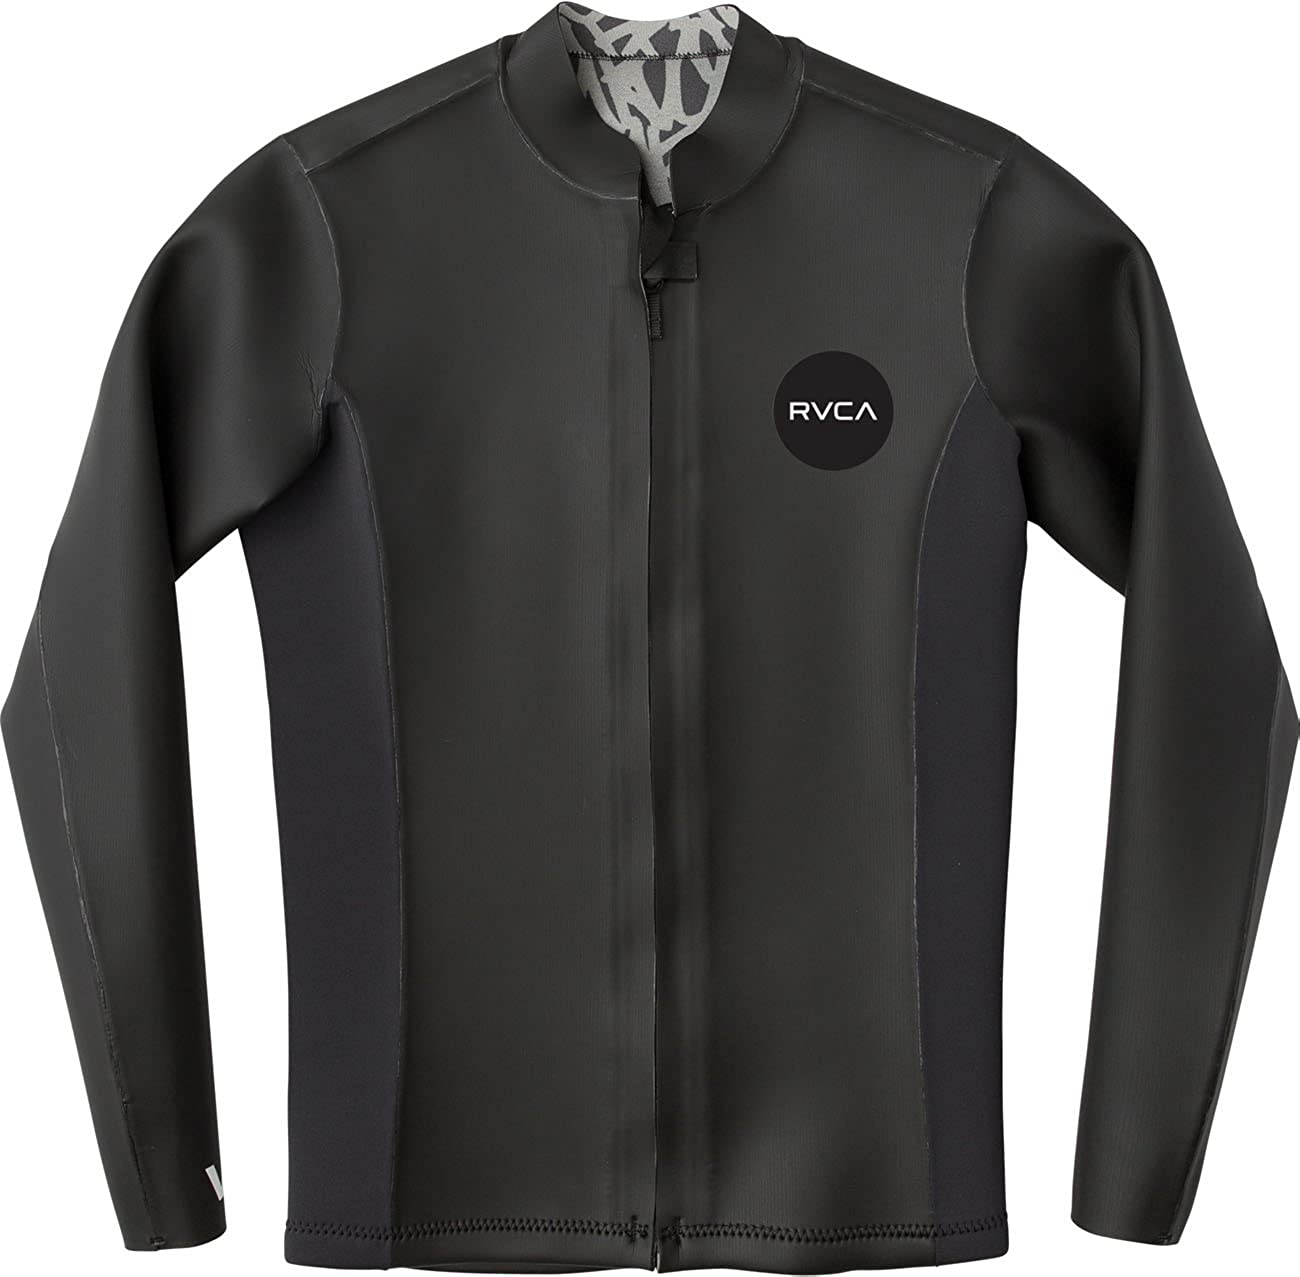 RVCA Mens Front Zip Smoothie Wetsuit Jacket